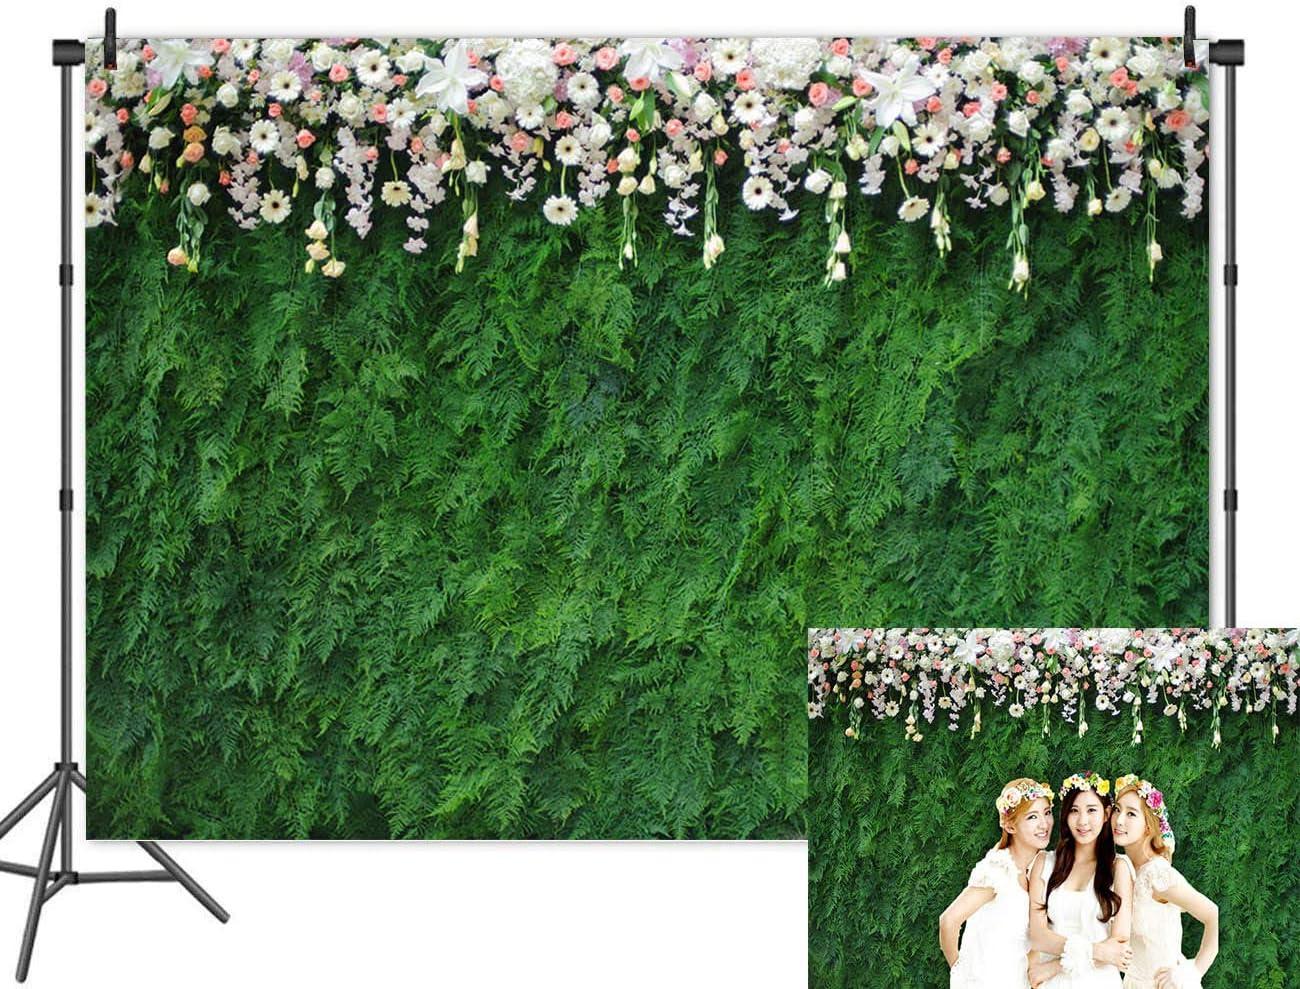 Qian Vinyl Nature Green Leaf Photography Backdrops 3D Floral Photo Backdrops for Wedding Bridal Shower Decoration Studio Props Banner 8x6ft